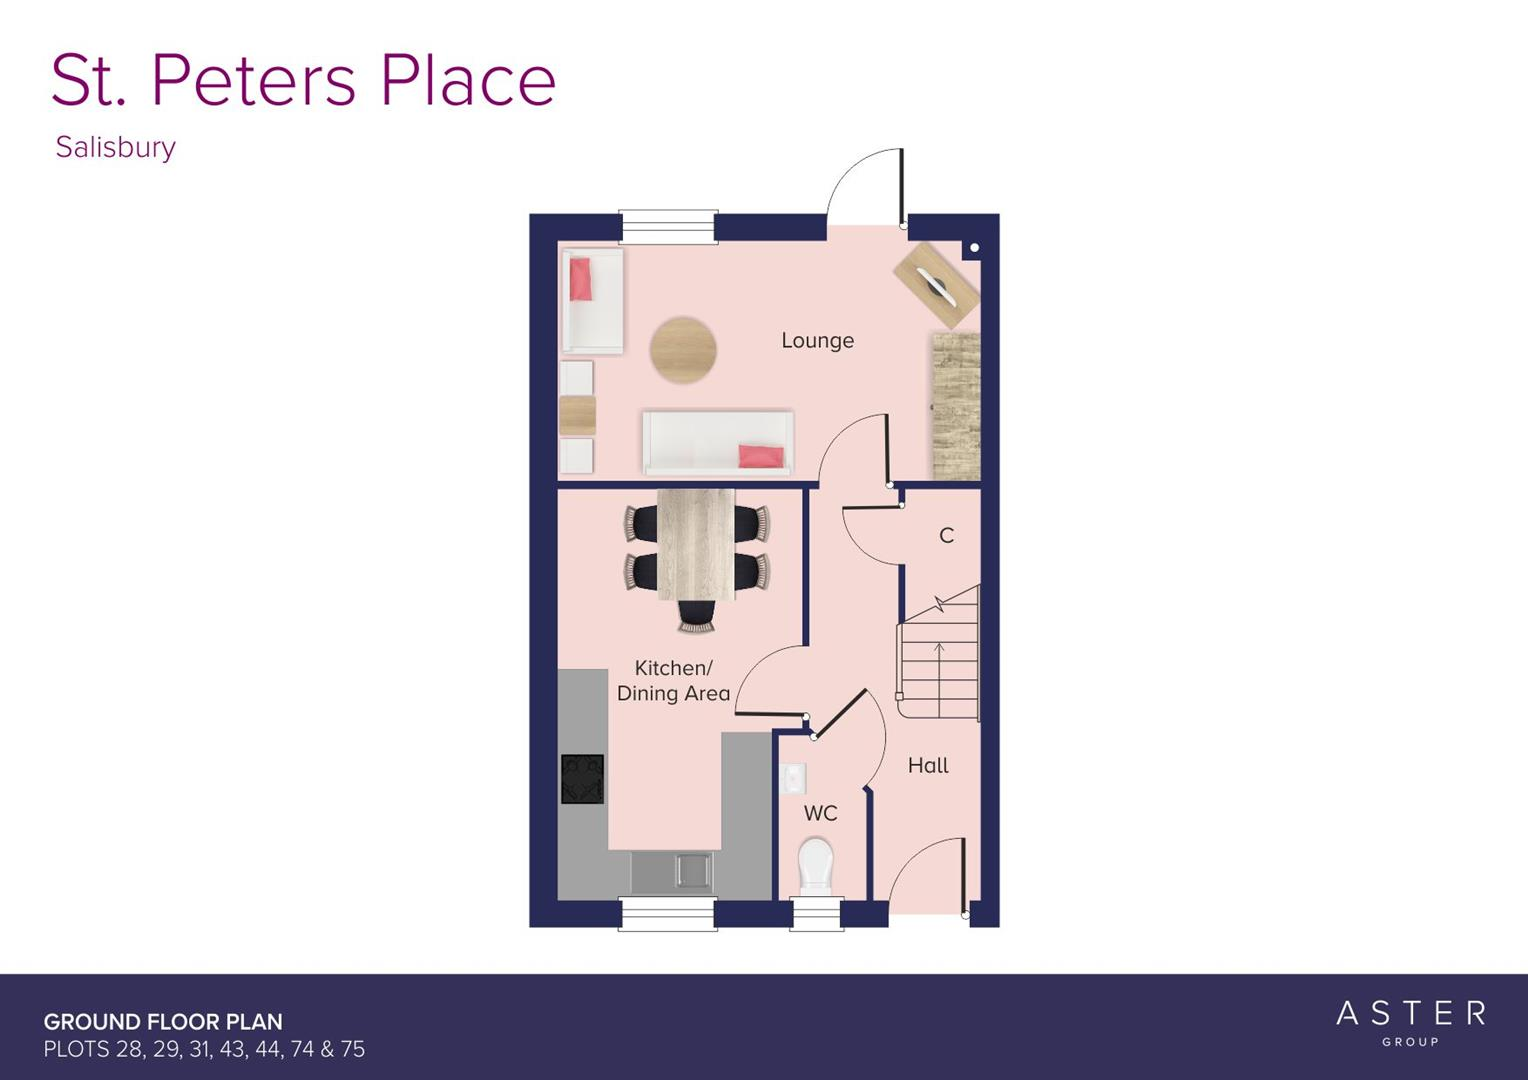 St. Peters Place, Salisbury_Plots 28, 29, 31, 43,